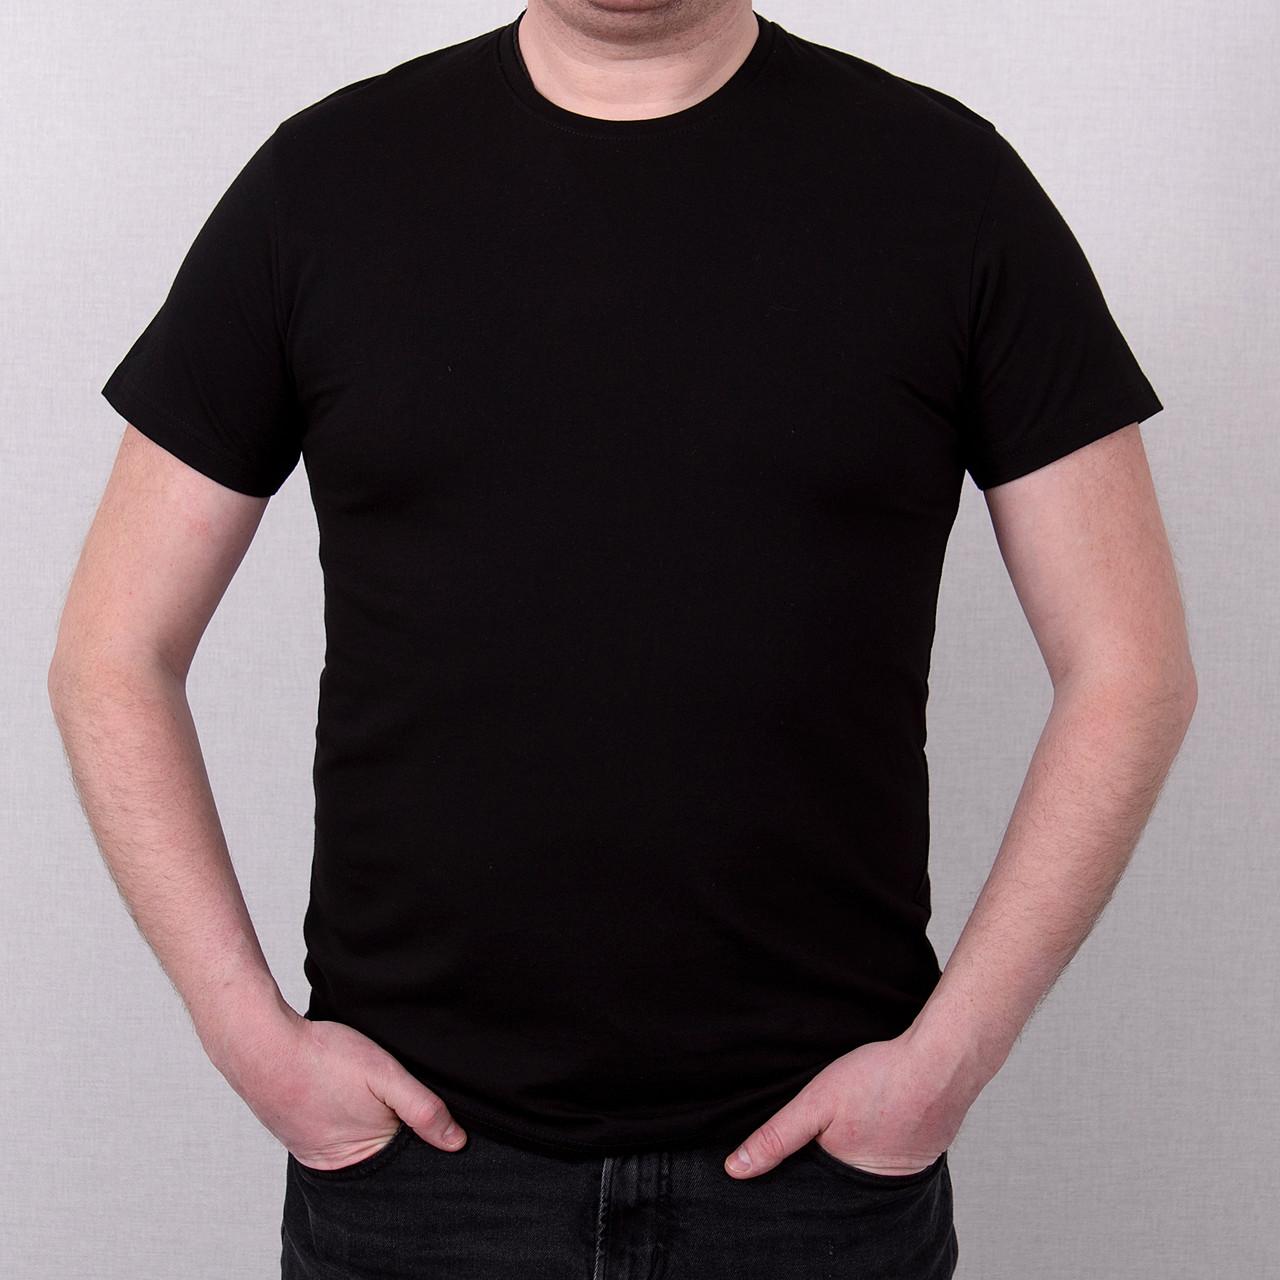 Мужская черная однотонная футболка большого размера \ Чоловіча чорна однотонна футболка великого розміру